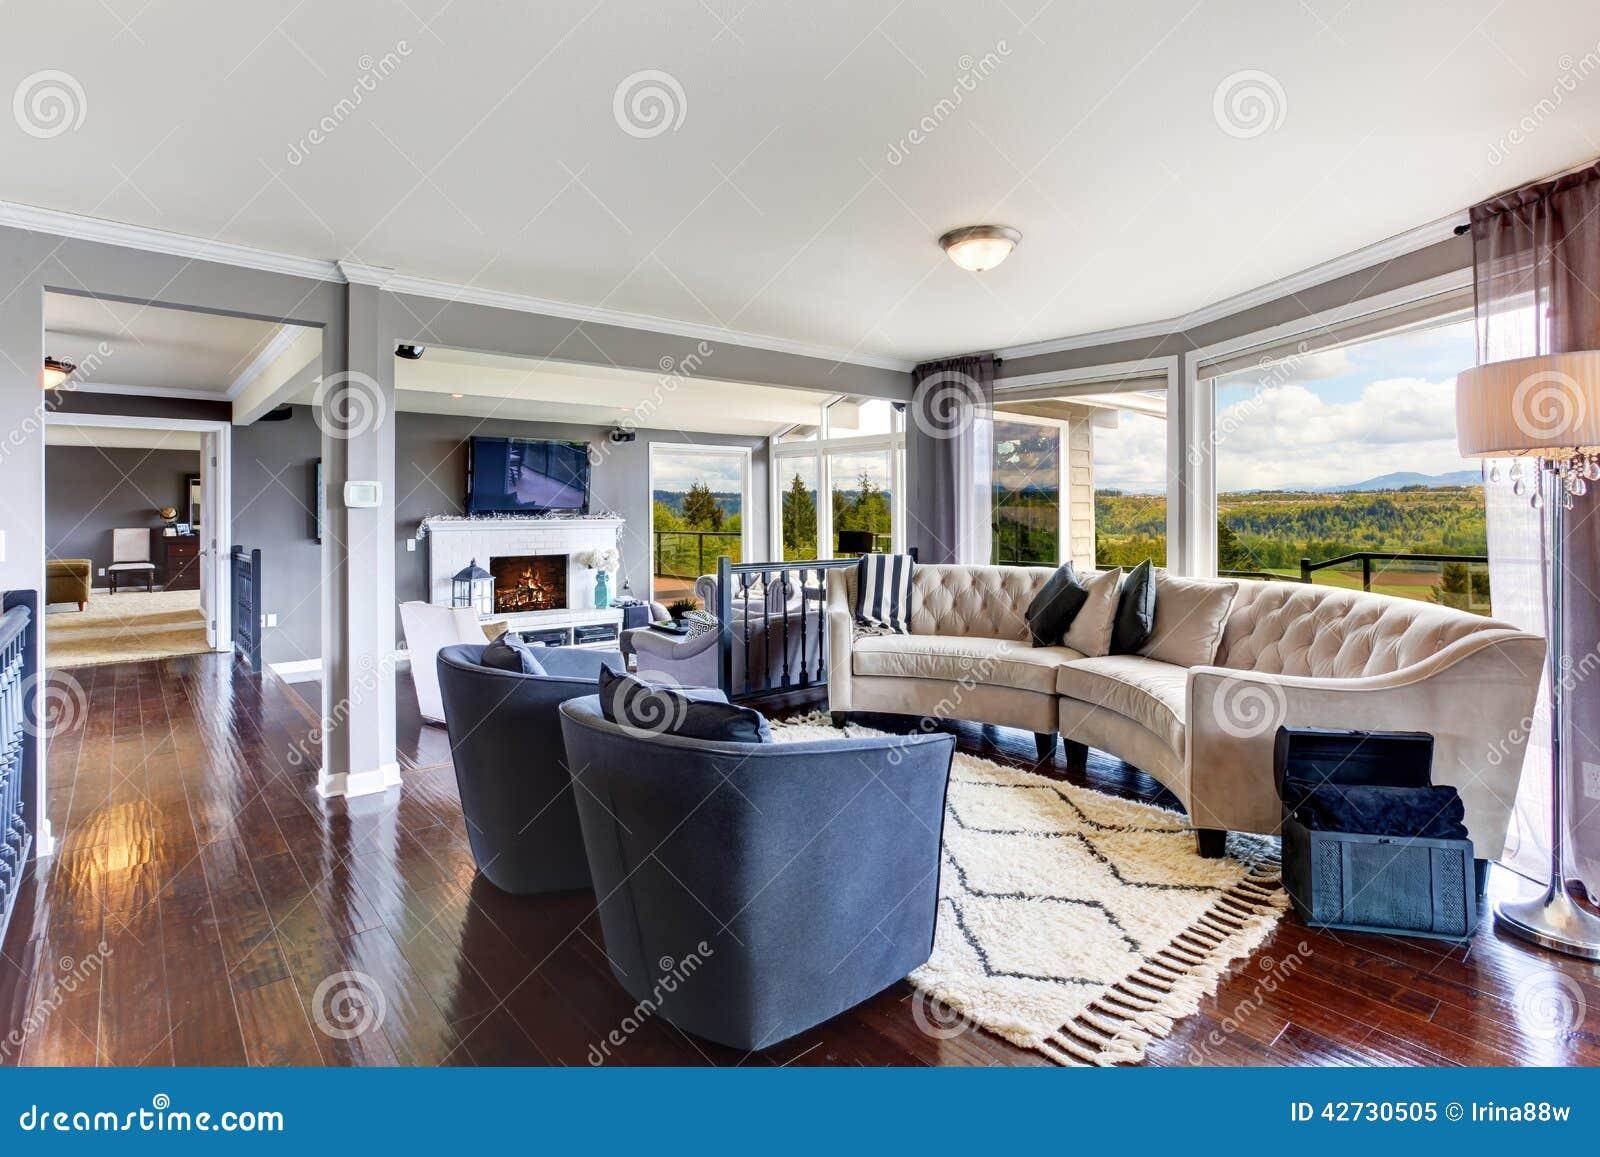 Elegant living room interior in luxury house - Kaplan furniture for elegant home interior ...